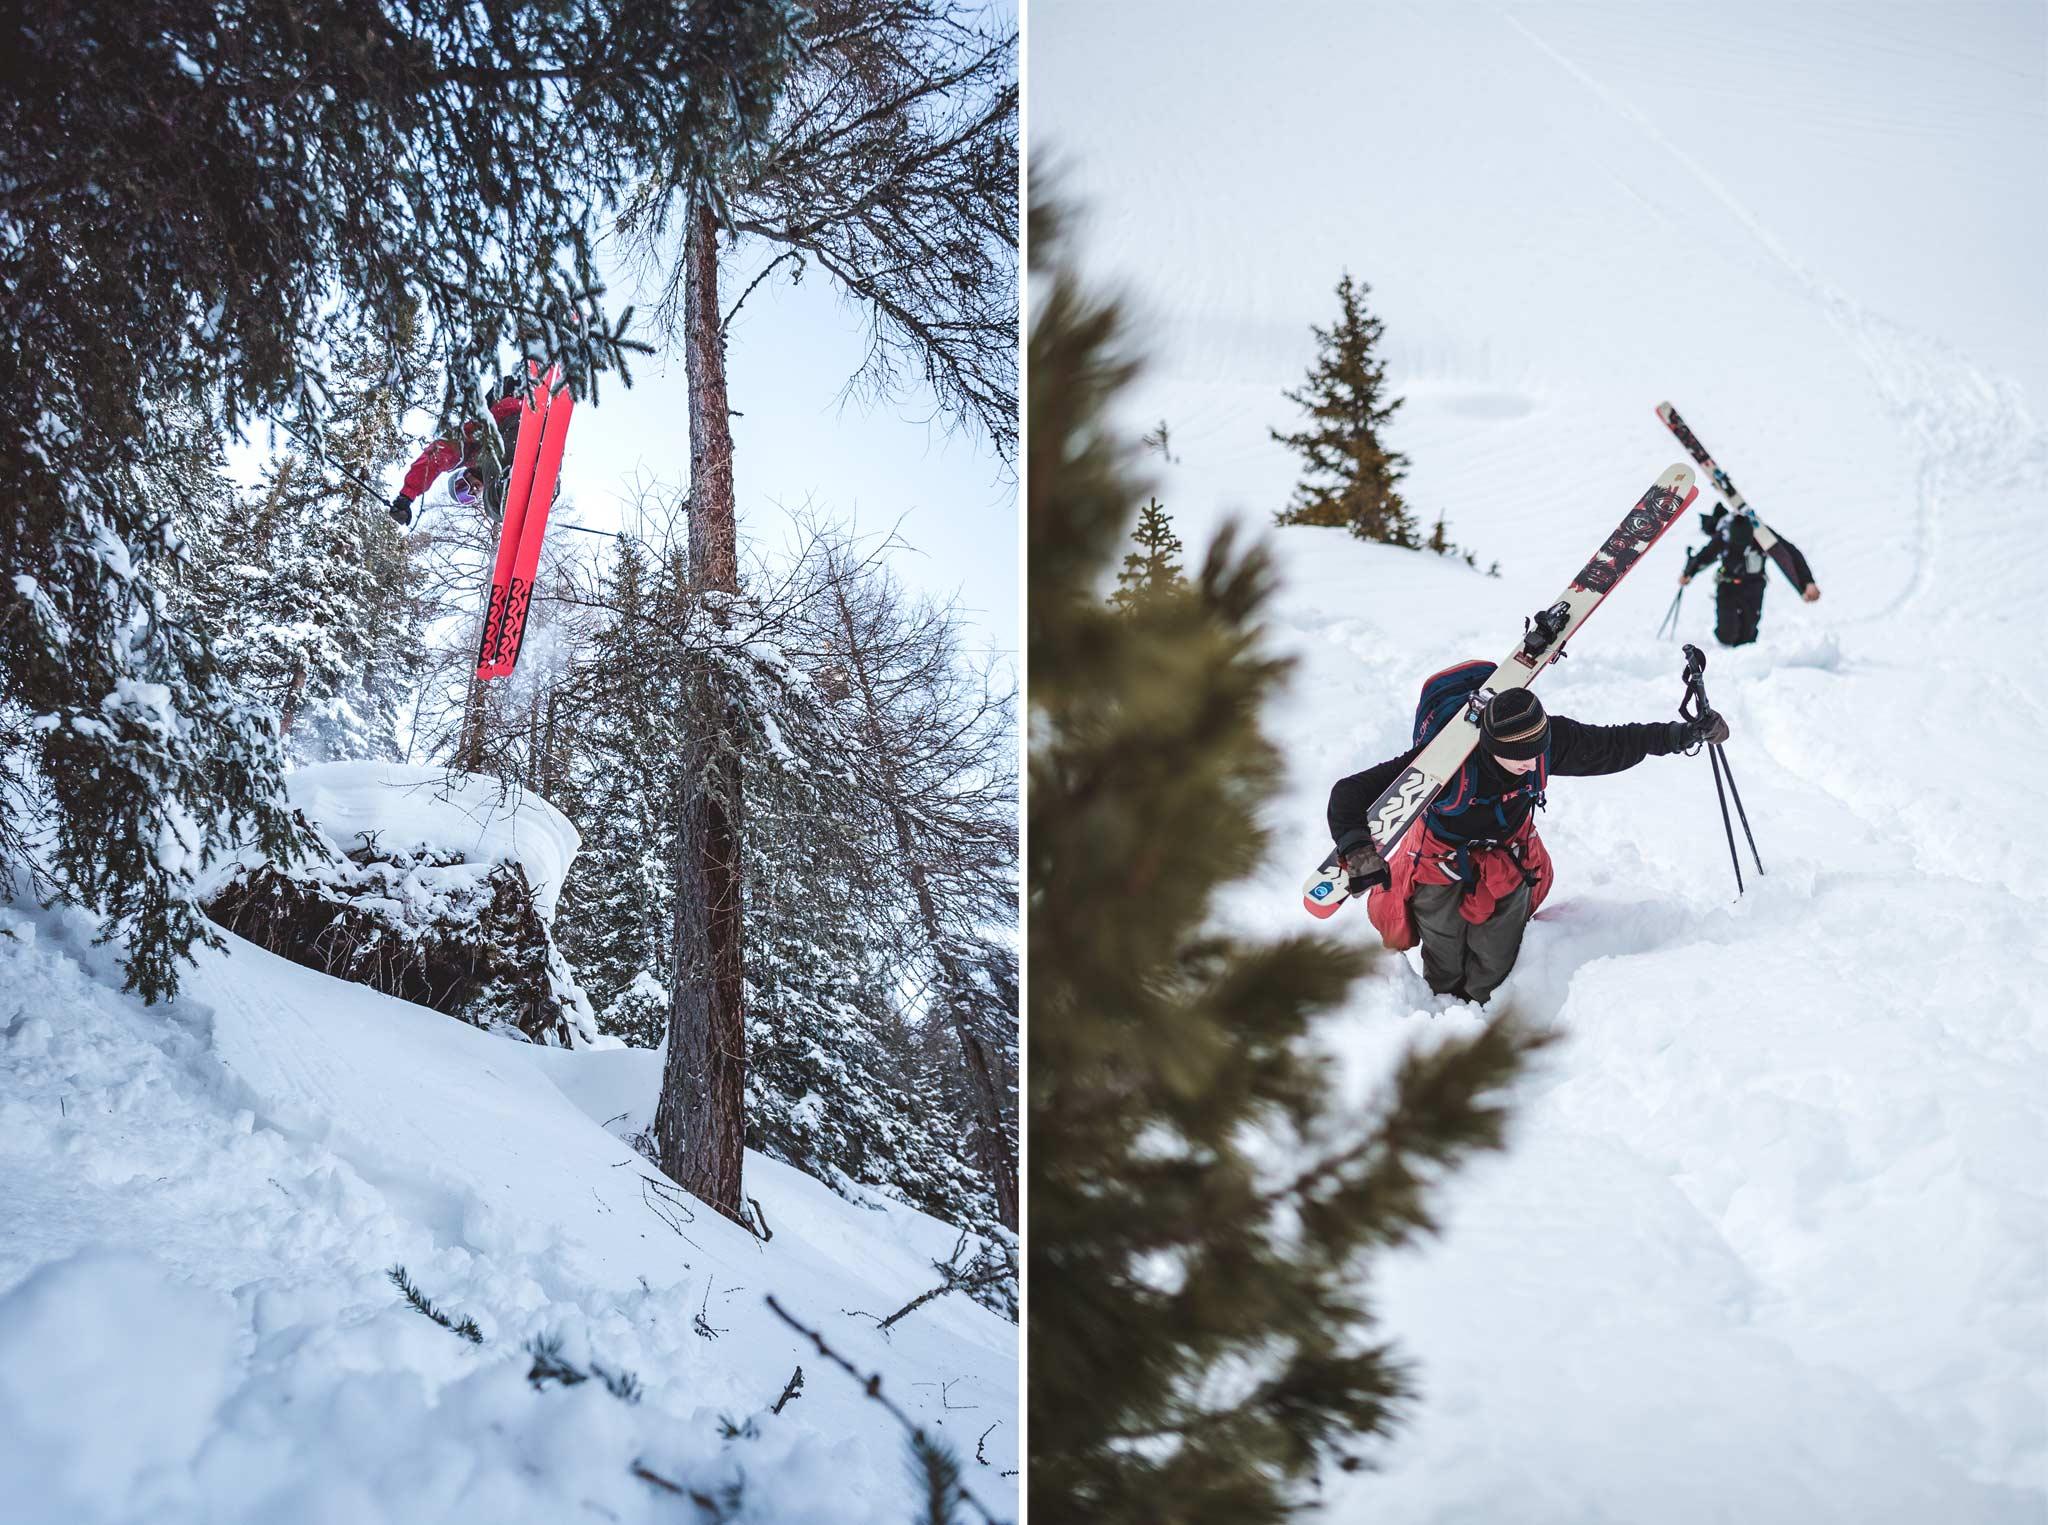 """Halcyon Days"" - Rider: Joona Kangas - Foto: Jörg Angeli / Prime Skiing"